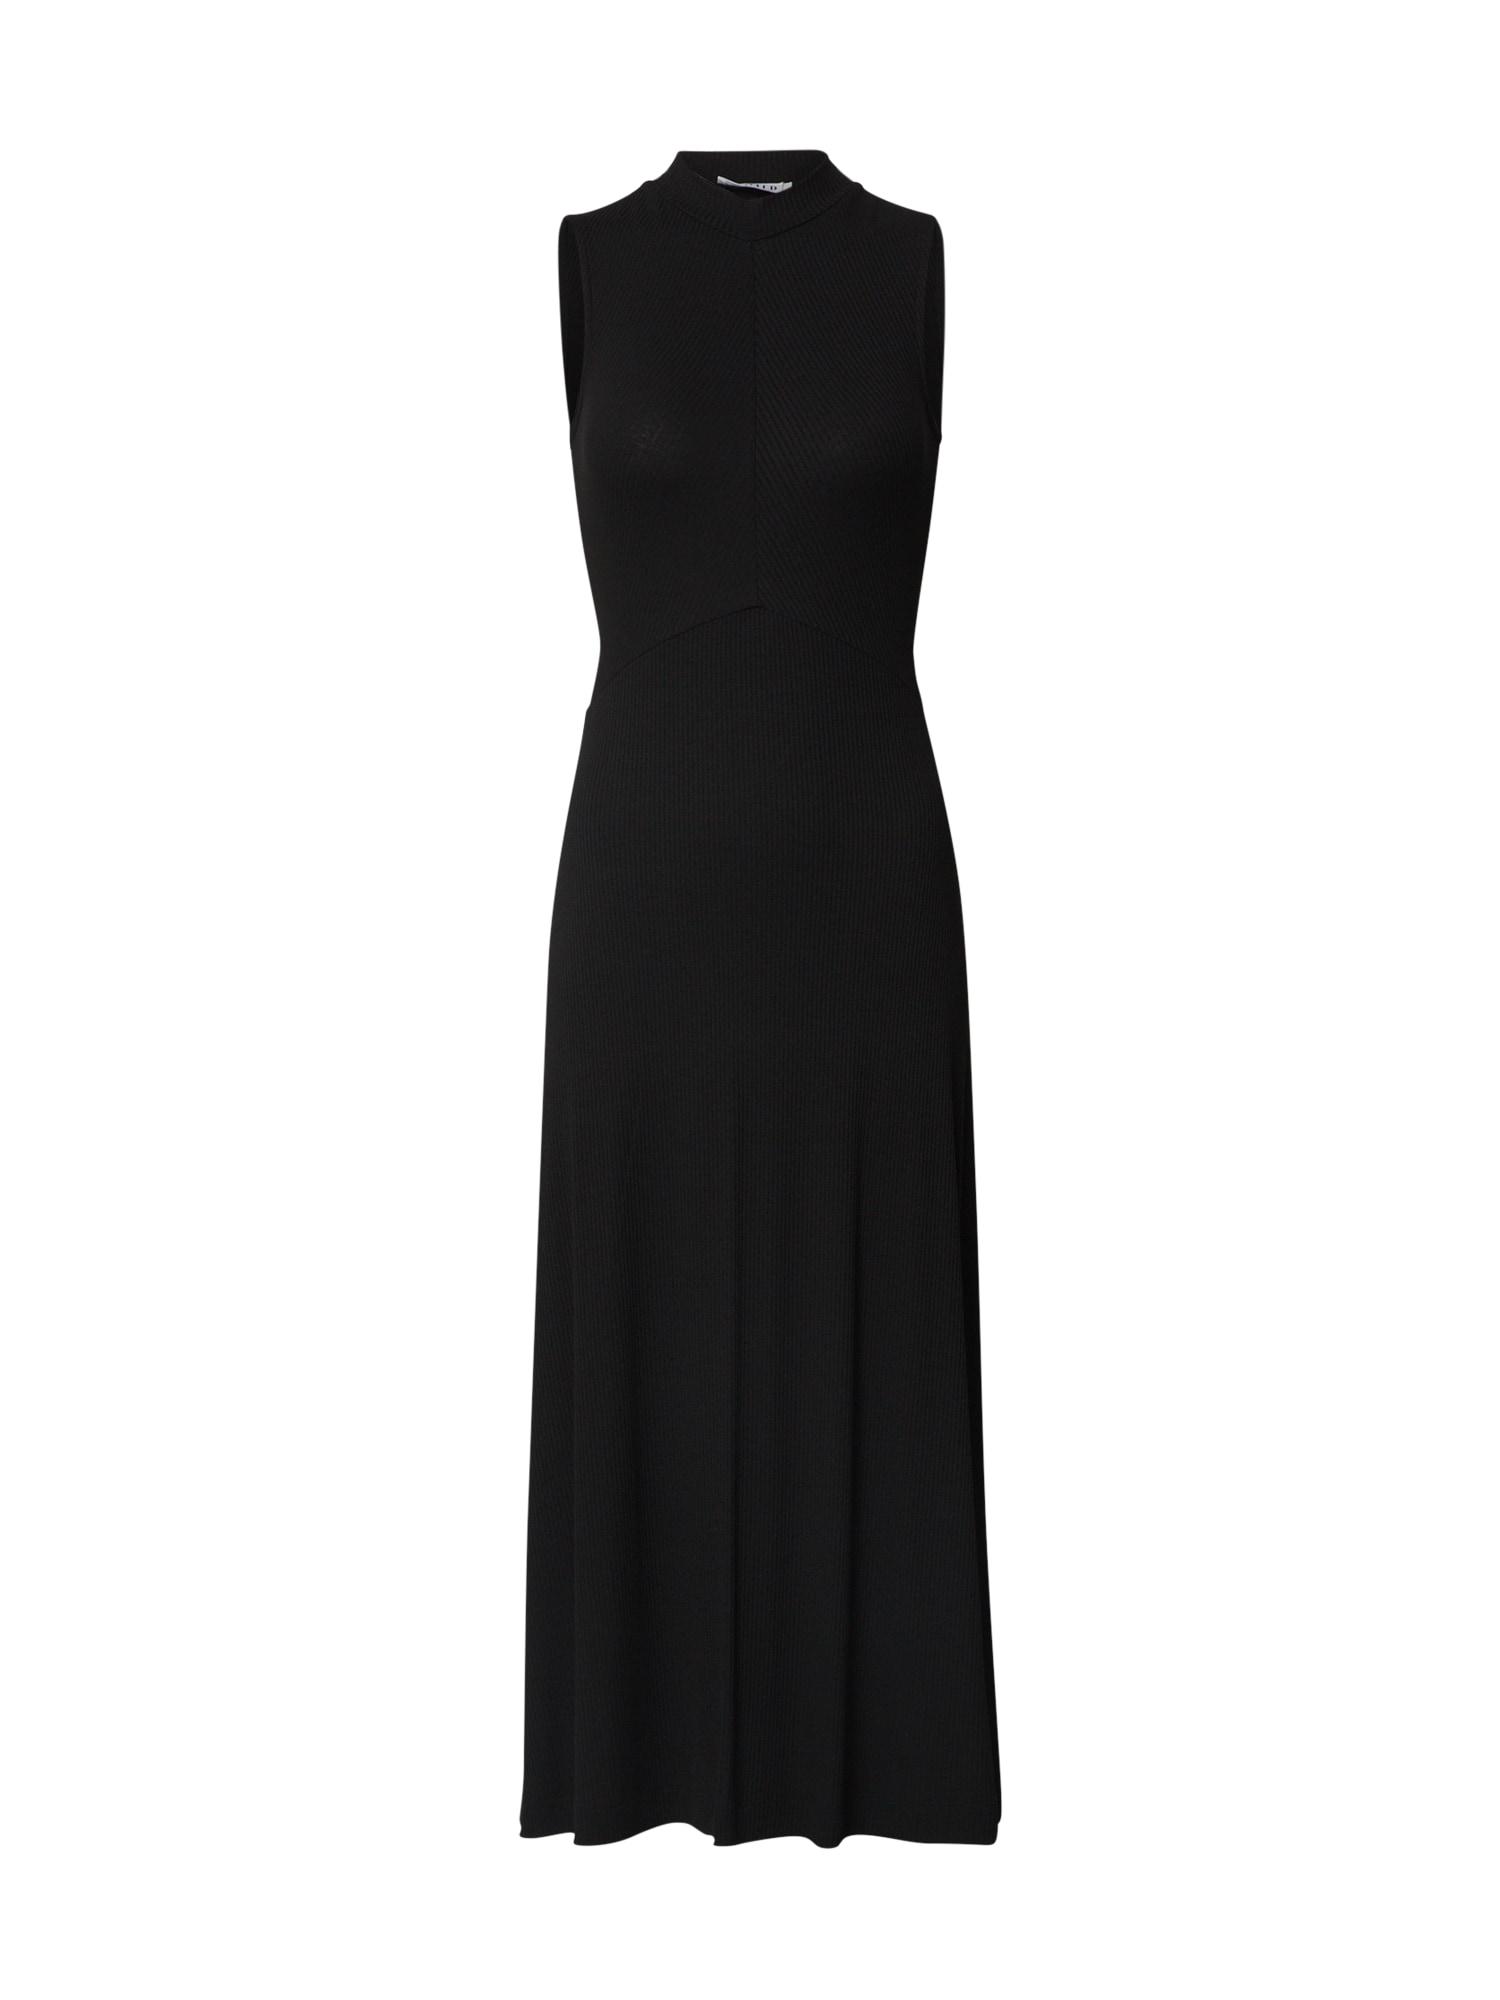 EDITED Suknelė 'Talia' juoda